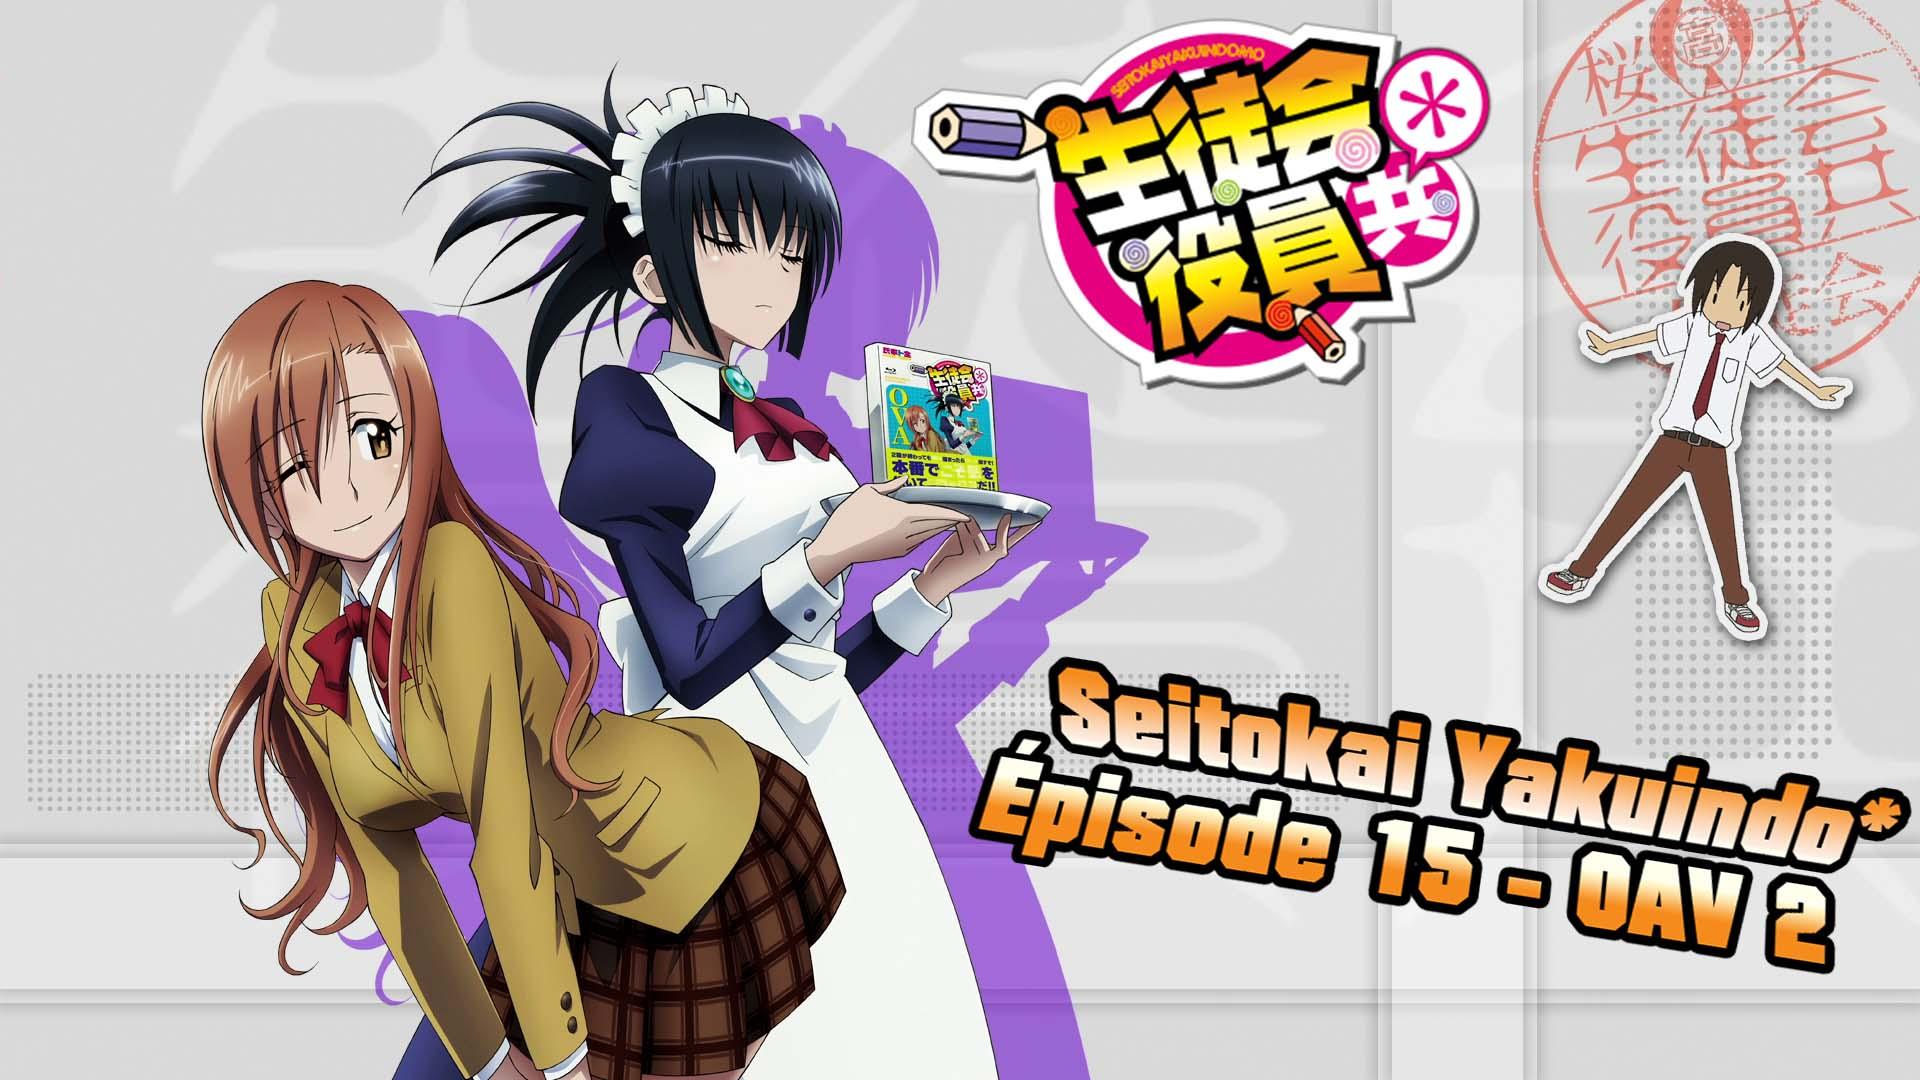 Seitokai Yakuindomo Saison 2 – Épisode 15 (OAV 2) Version 2